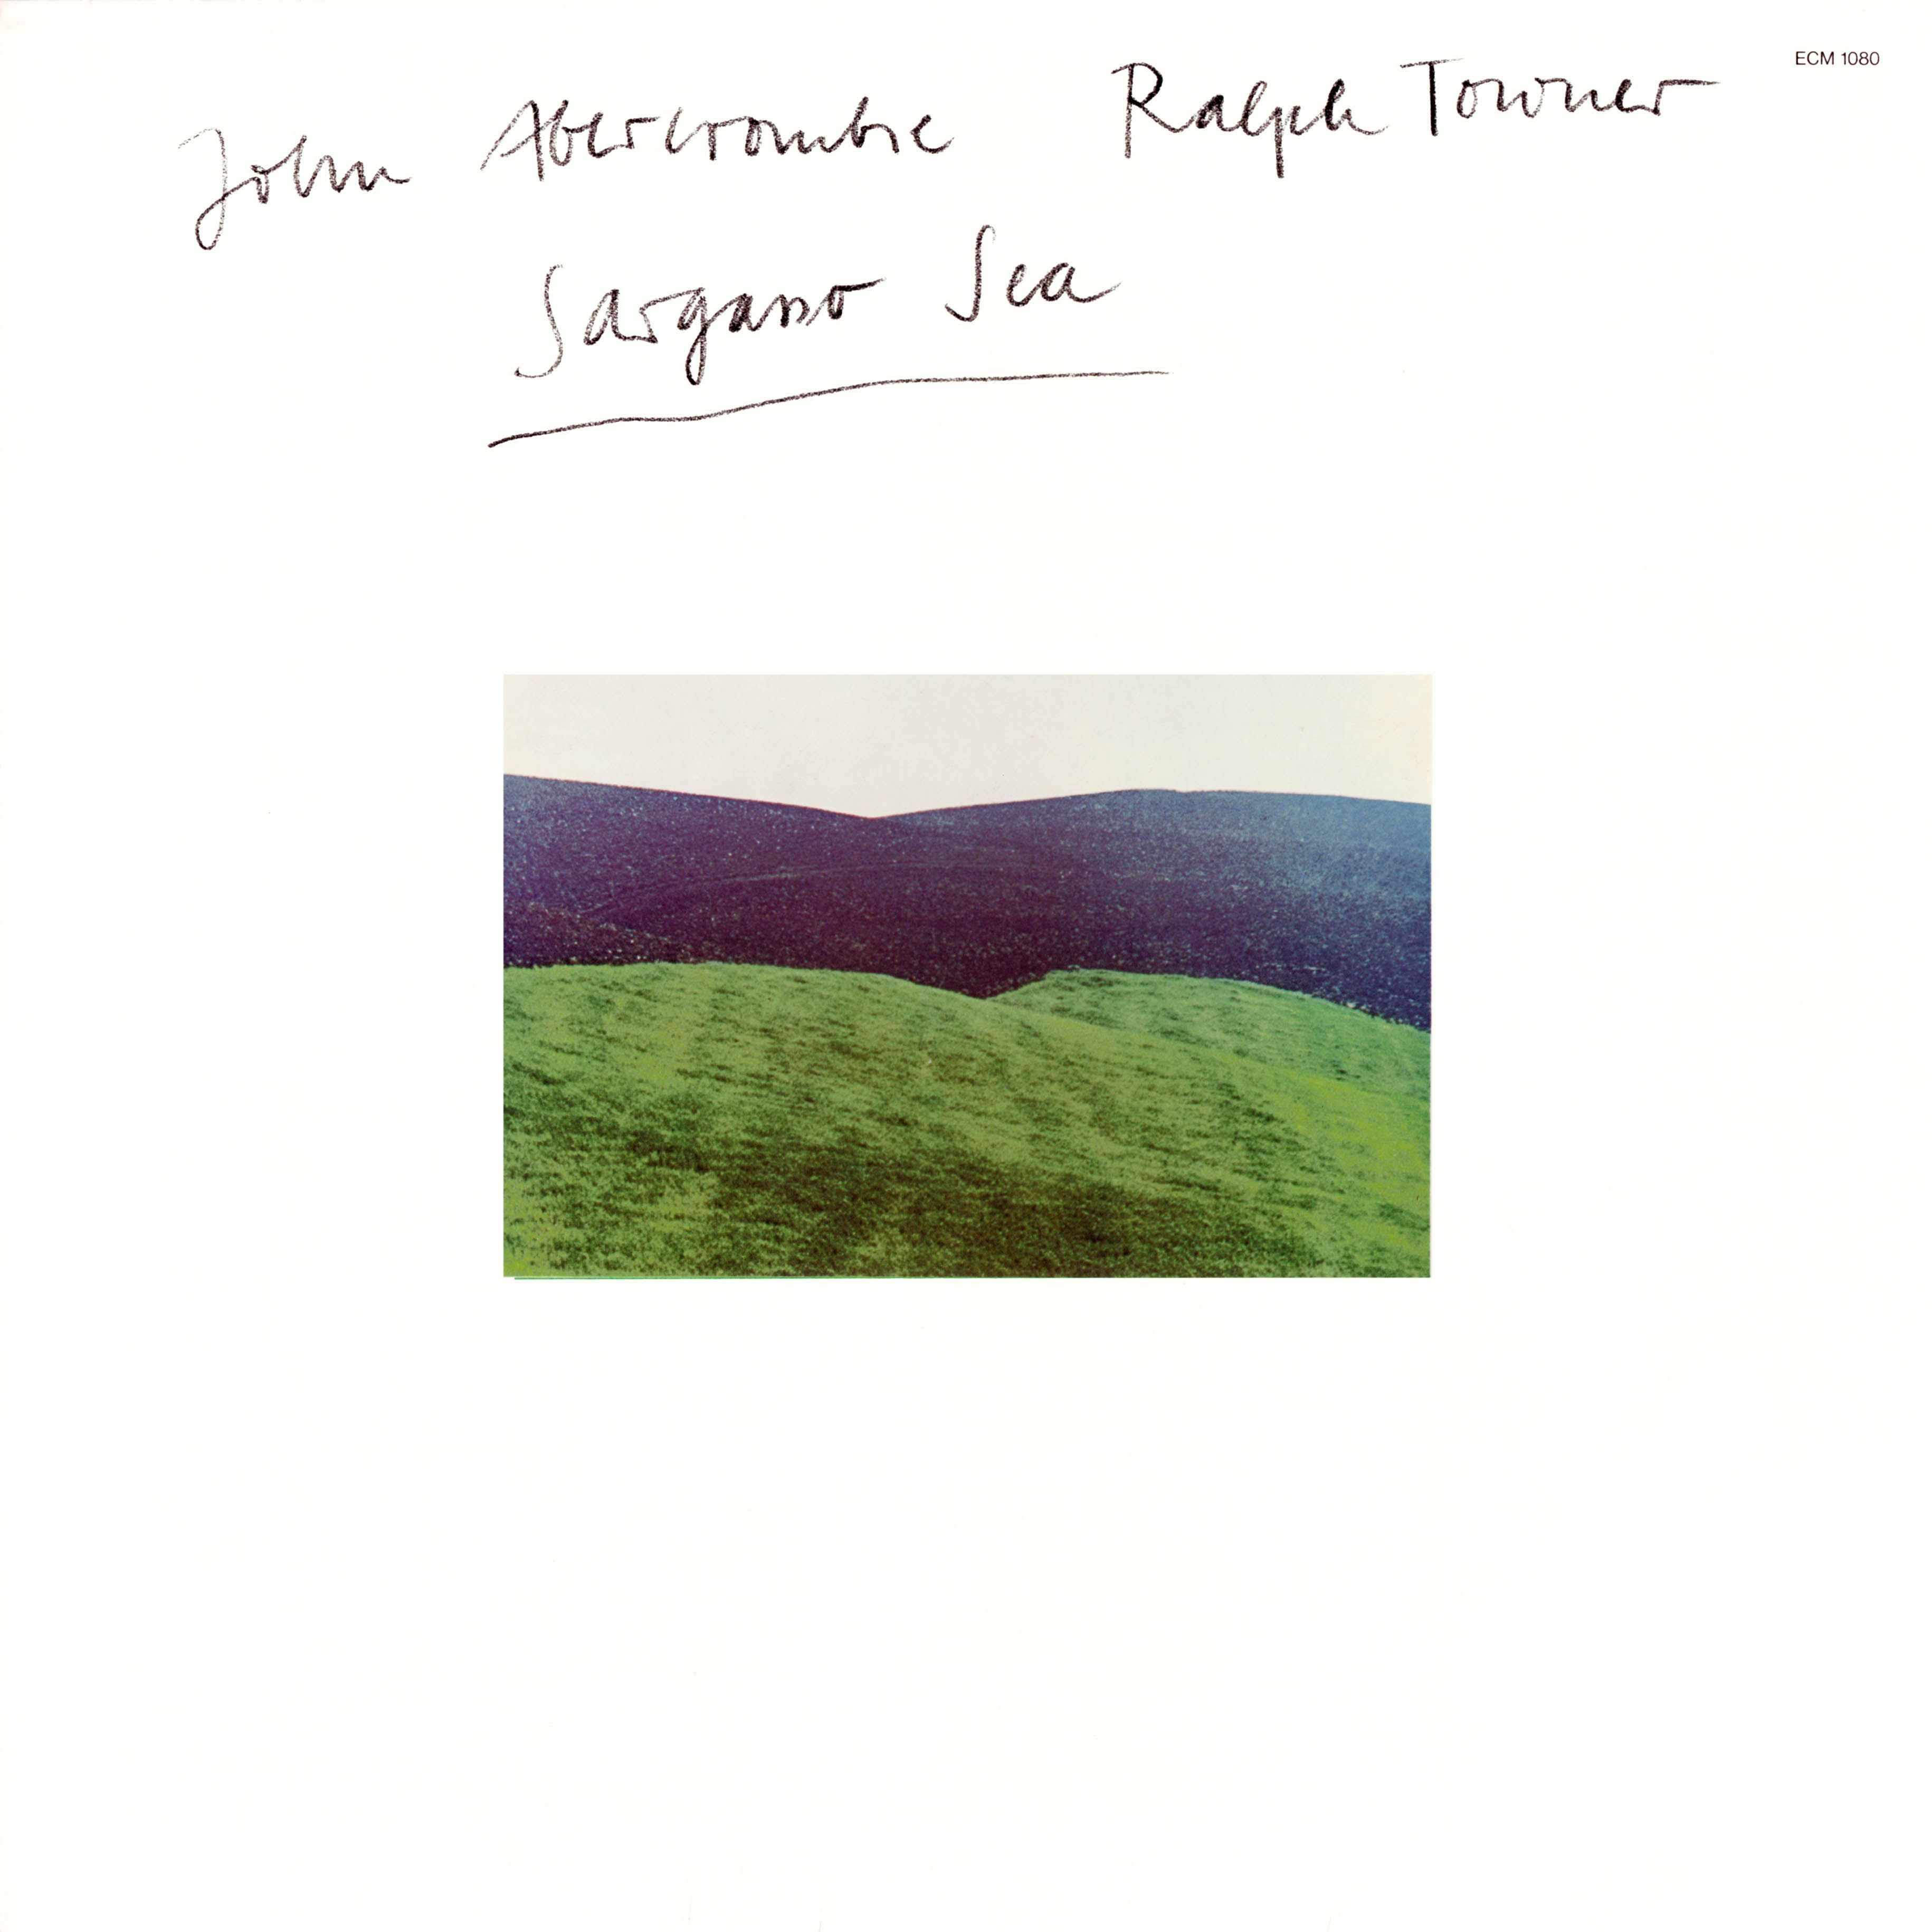 John Abercrombie Ralph Towner 1976 Sargasso Sea Ecm 1080